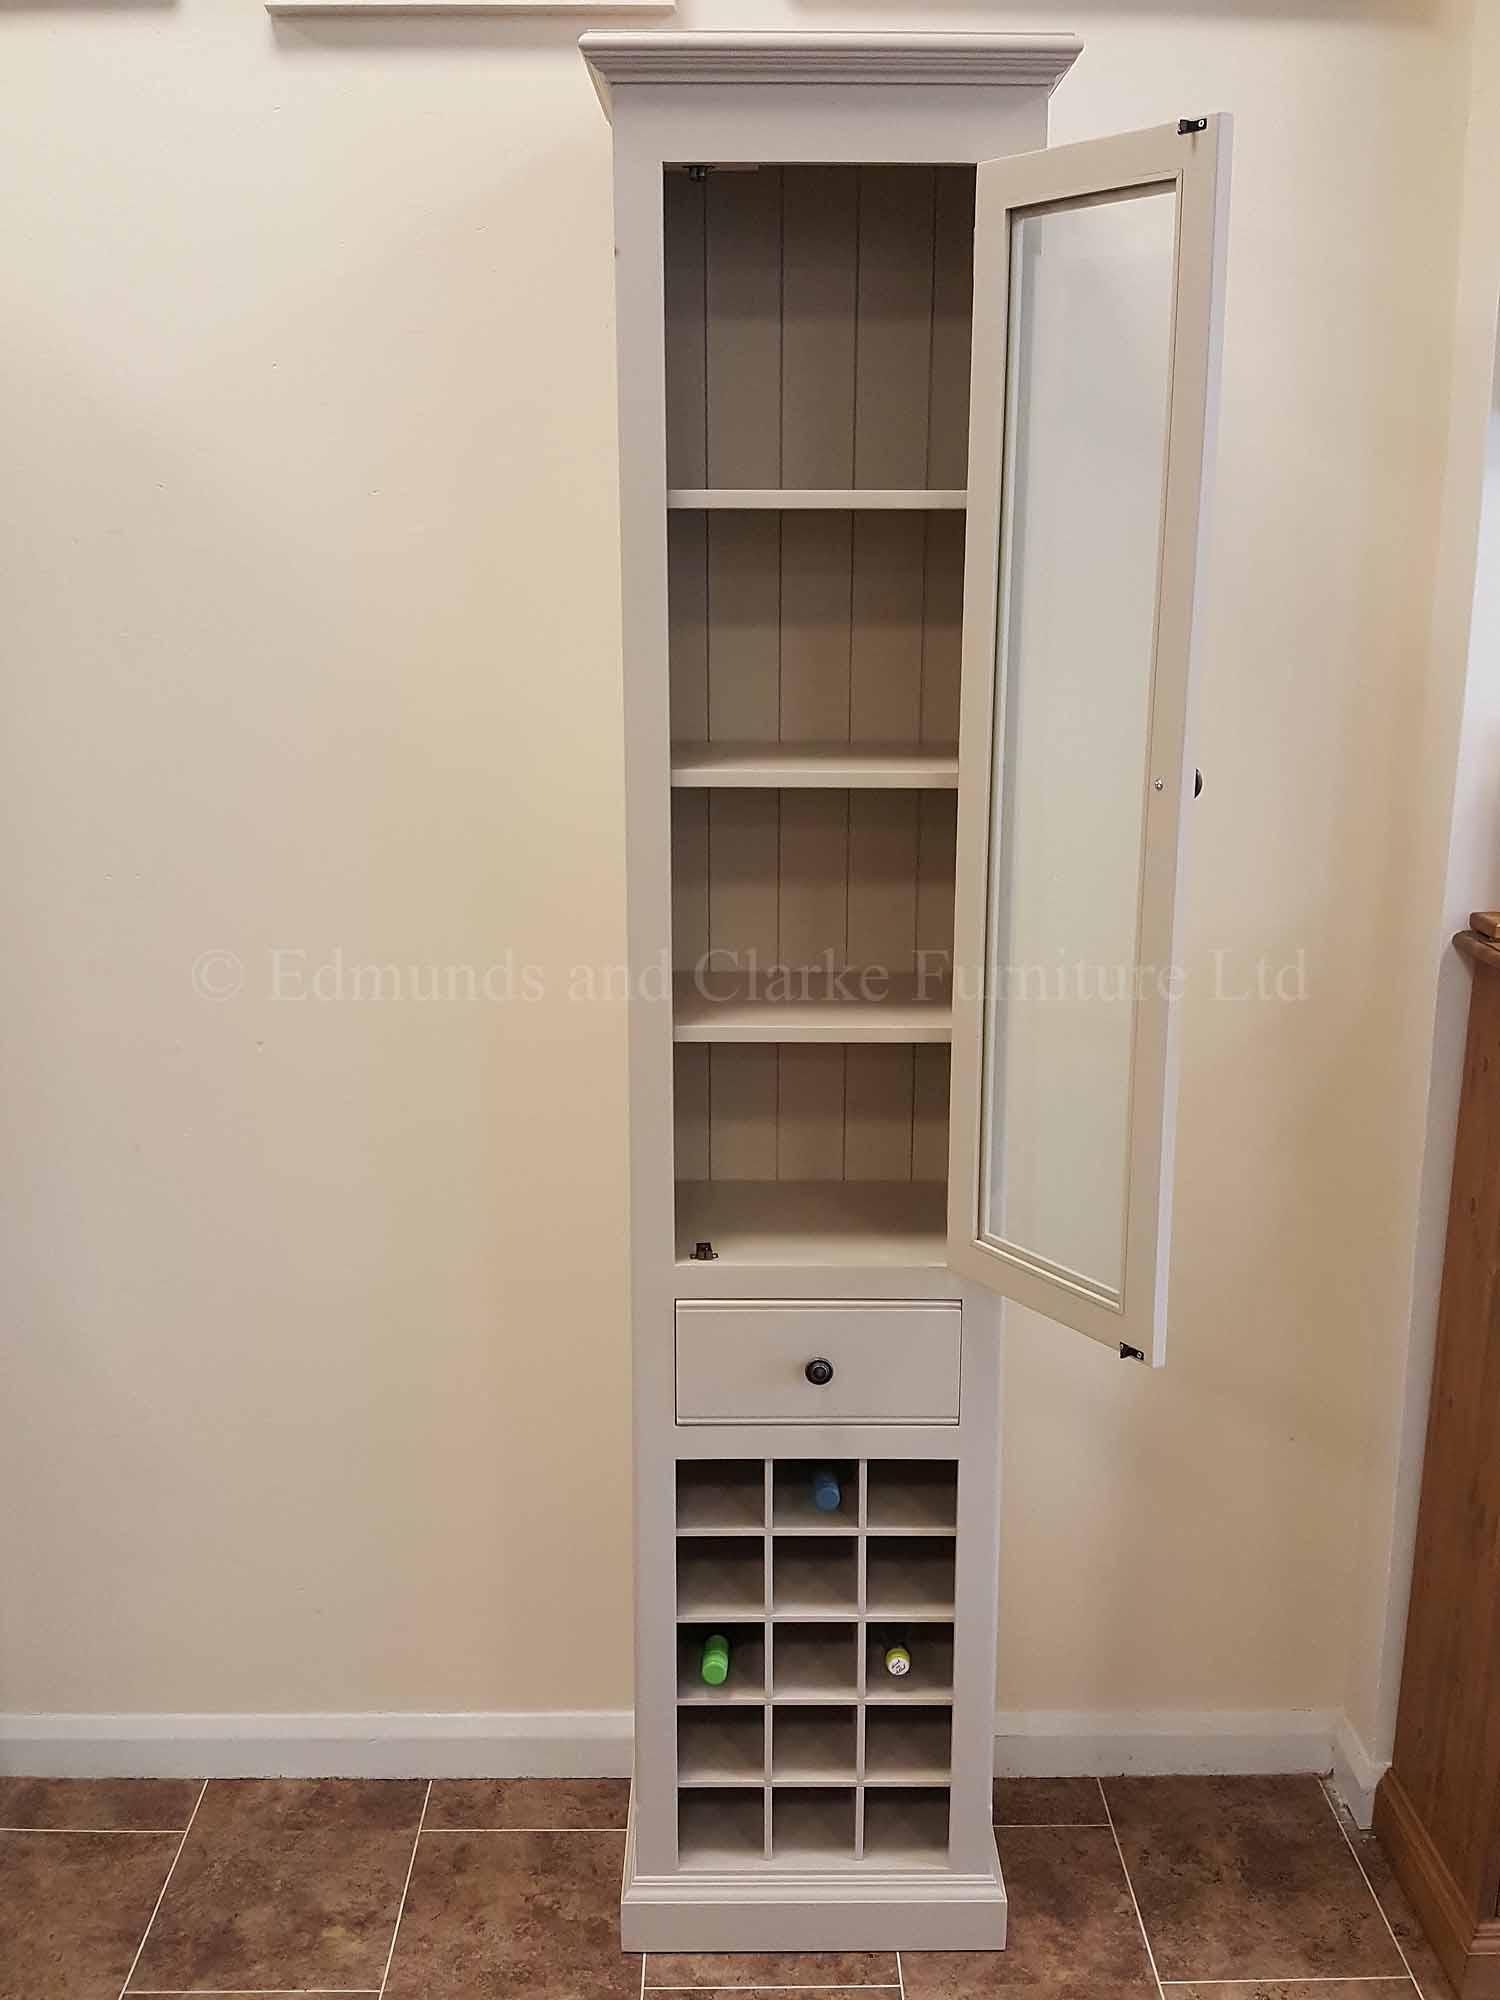 Tall narrow kitchen cupboard with glazed door and wine rack below